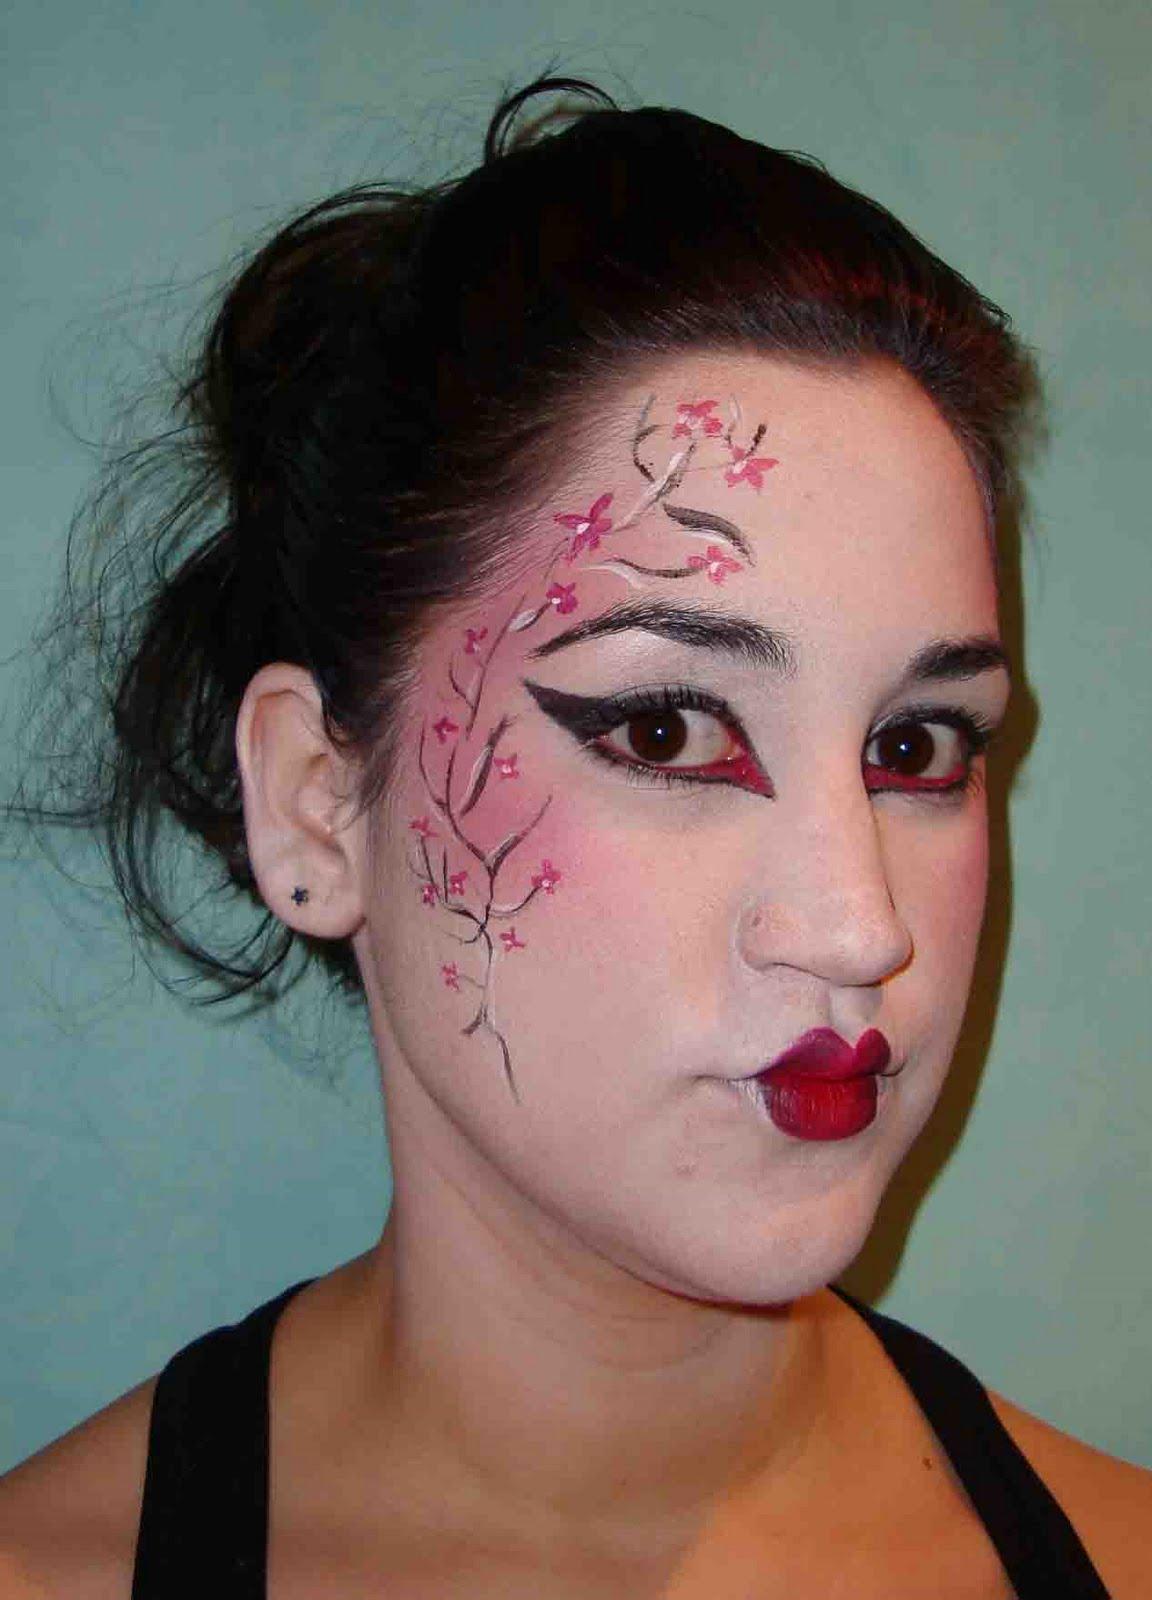 http://3.bp.blogspot.com/_TEkiCLKKIPc/S7UdV2_MaVI/AAAAAAAAAEQ/dqSh6Mc8mCk/s1600/geisha.jpg